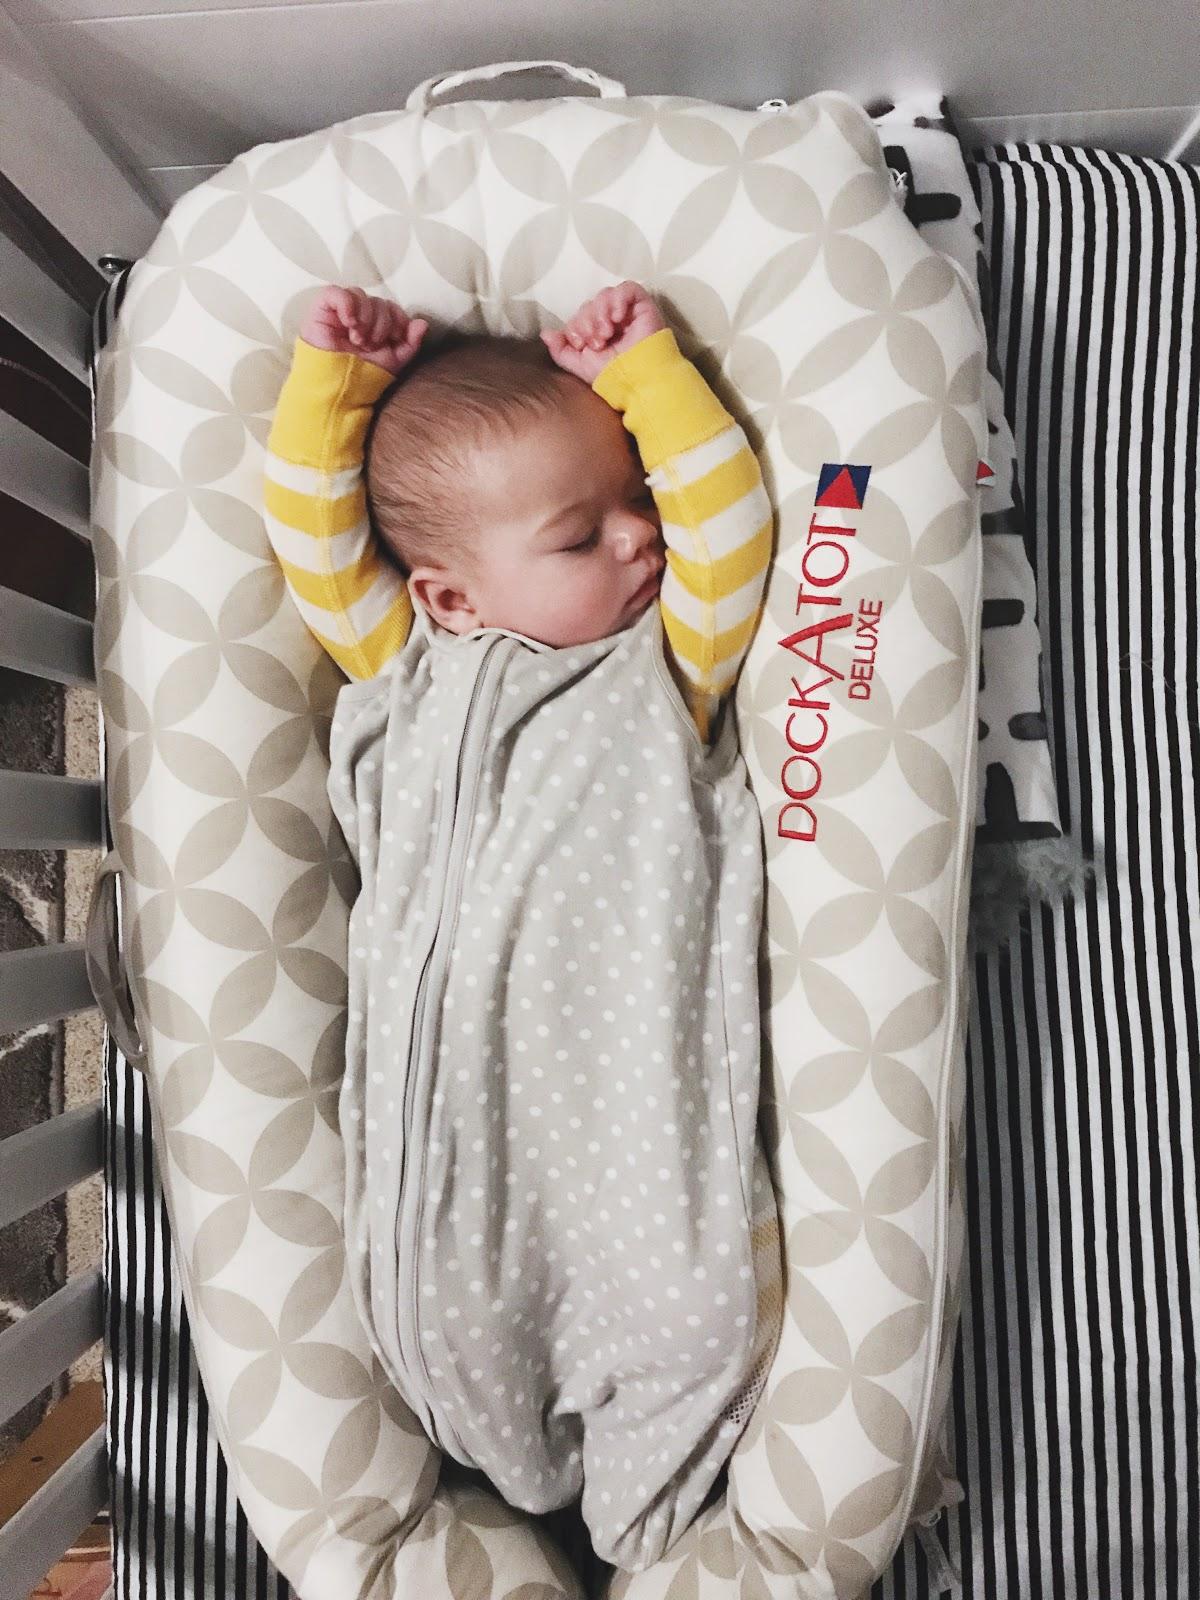 Brady Jordan   5 months   PB+J babes   Bloglovin'